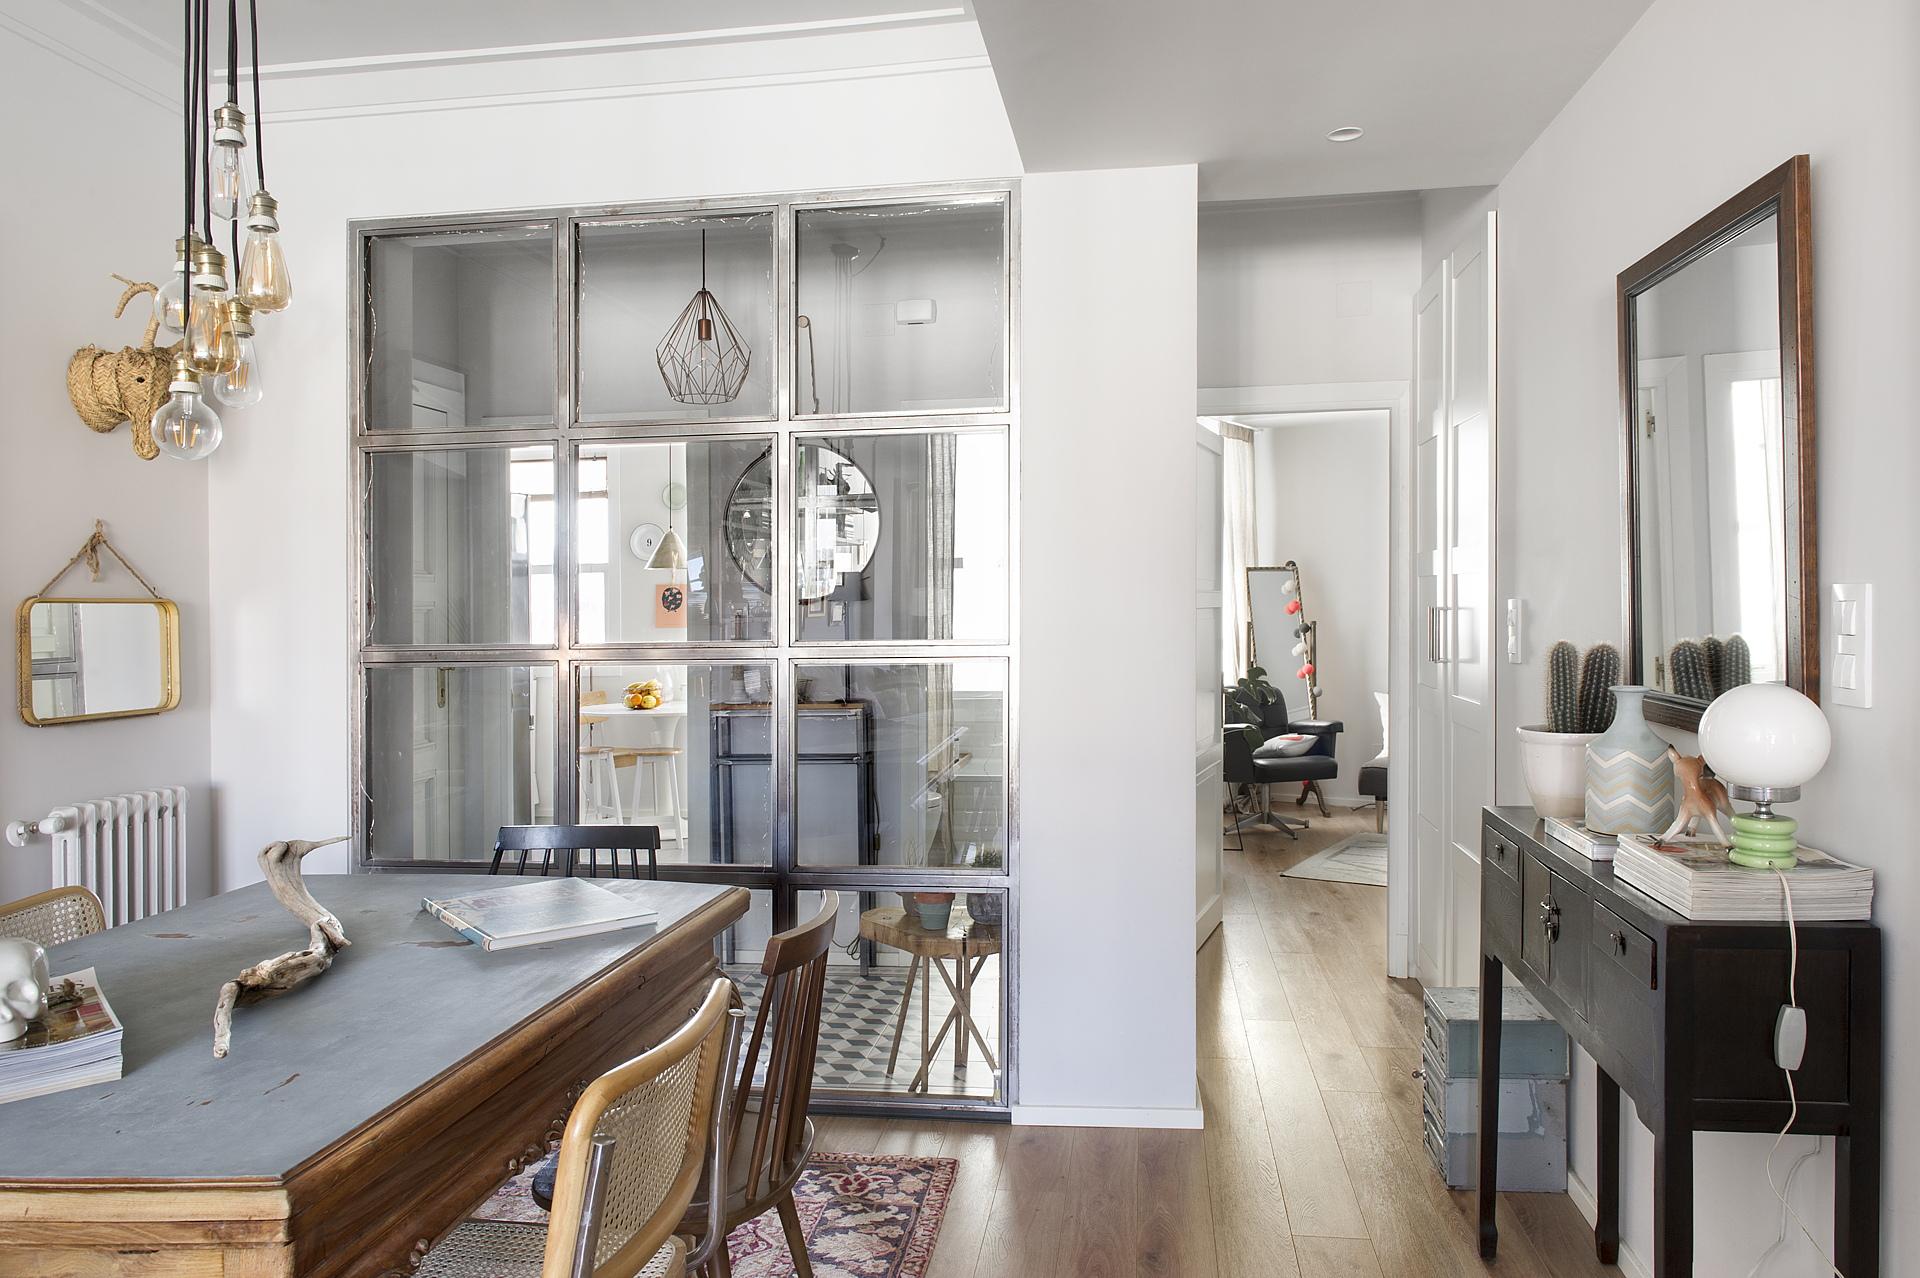 Egue y seta gaila 39 s home the house of an interior for Idee interior design